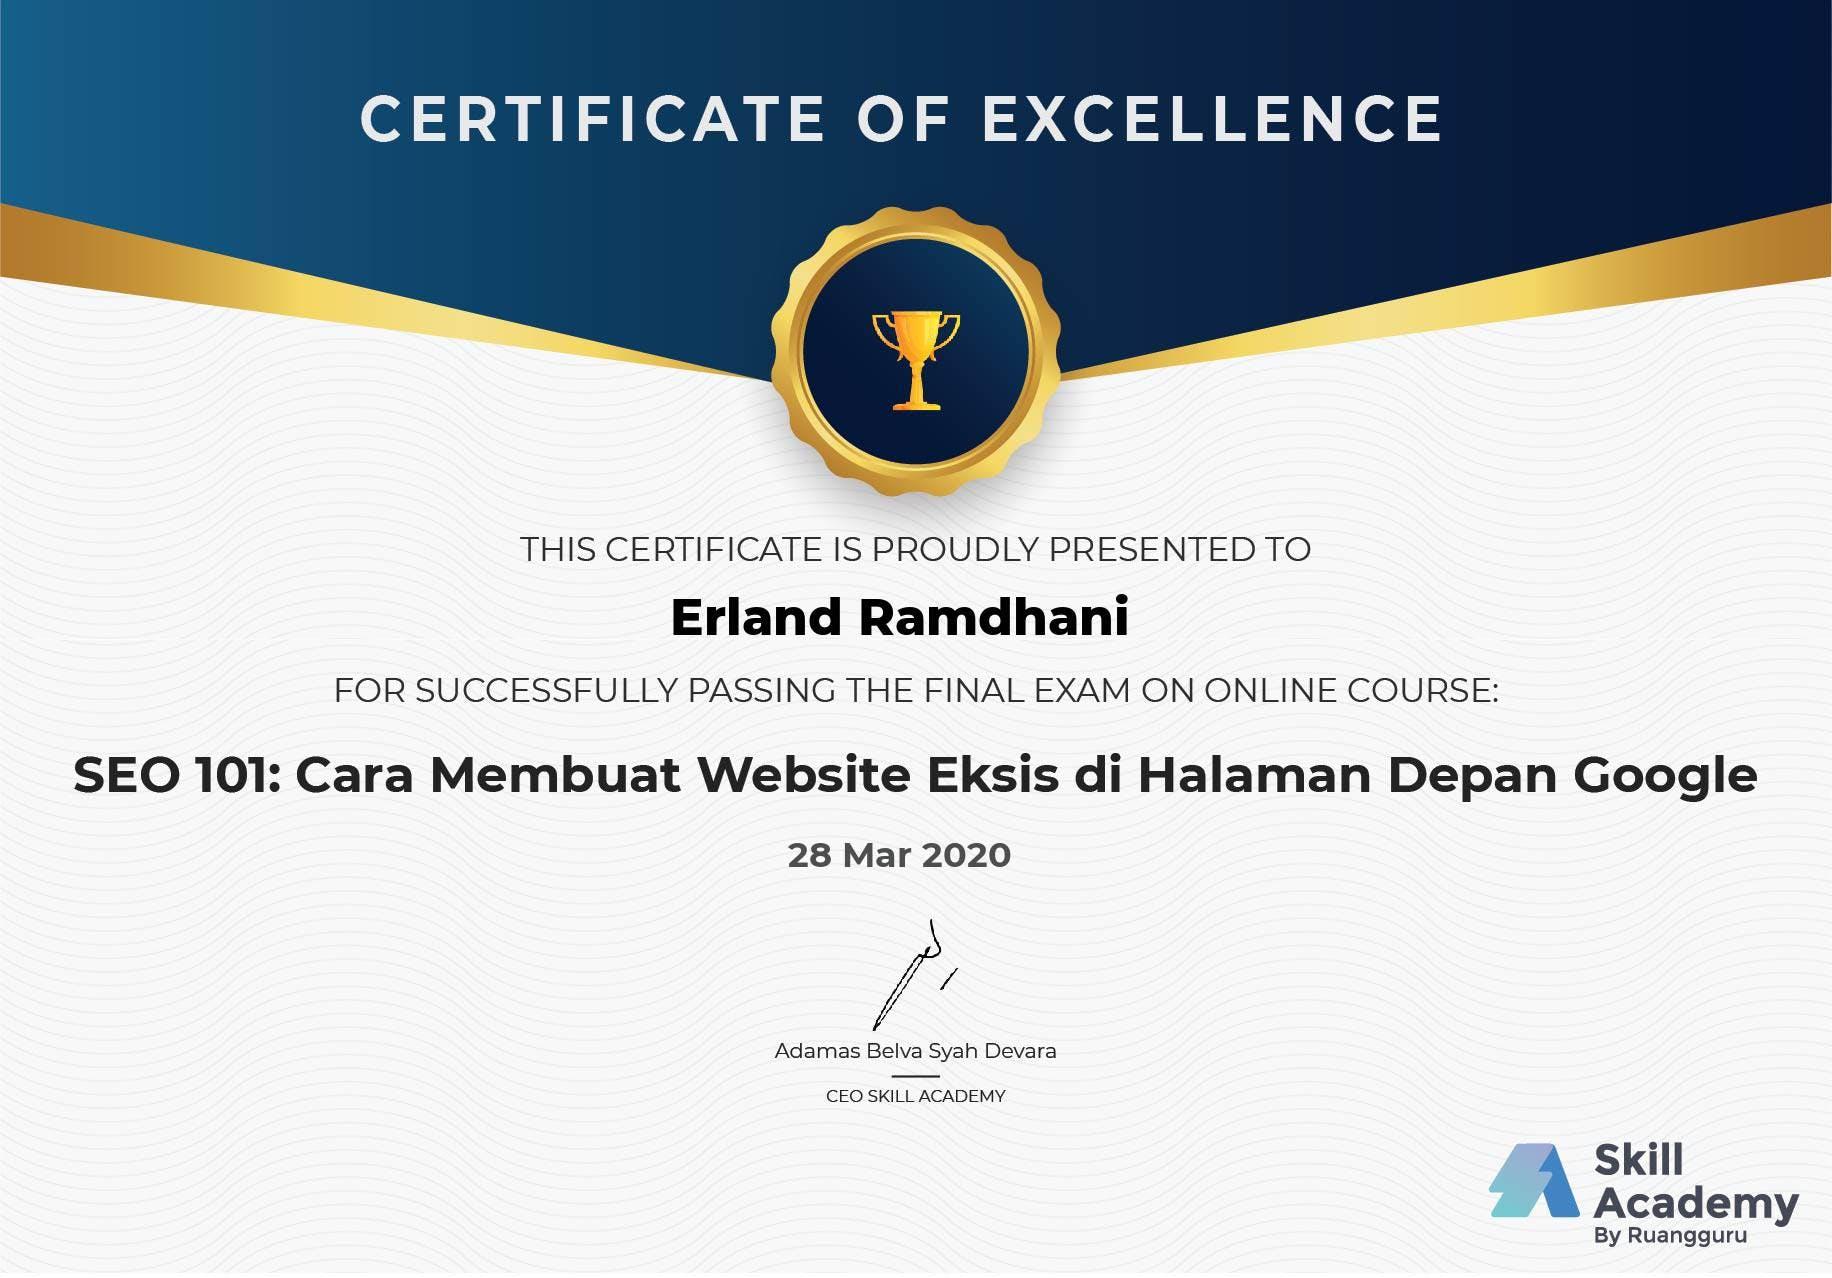 Skill Academy SEO Certificate